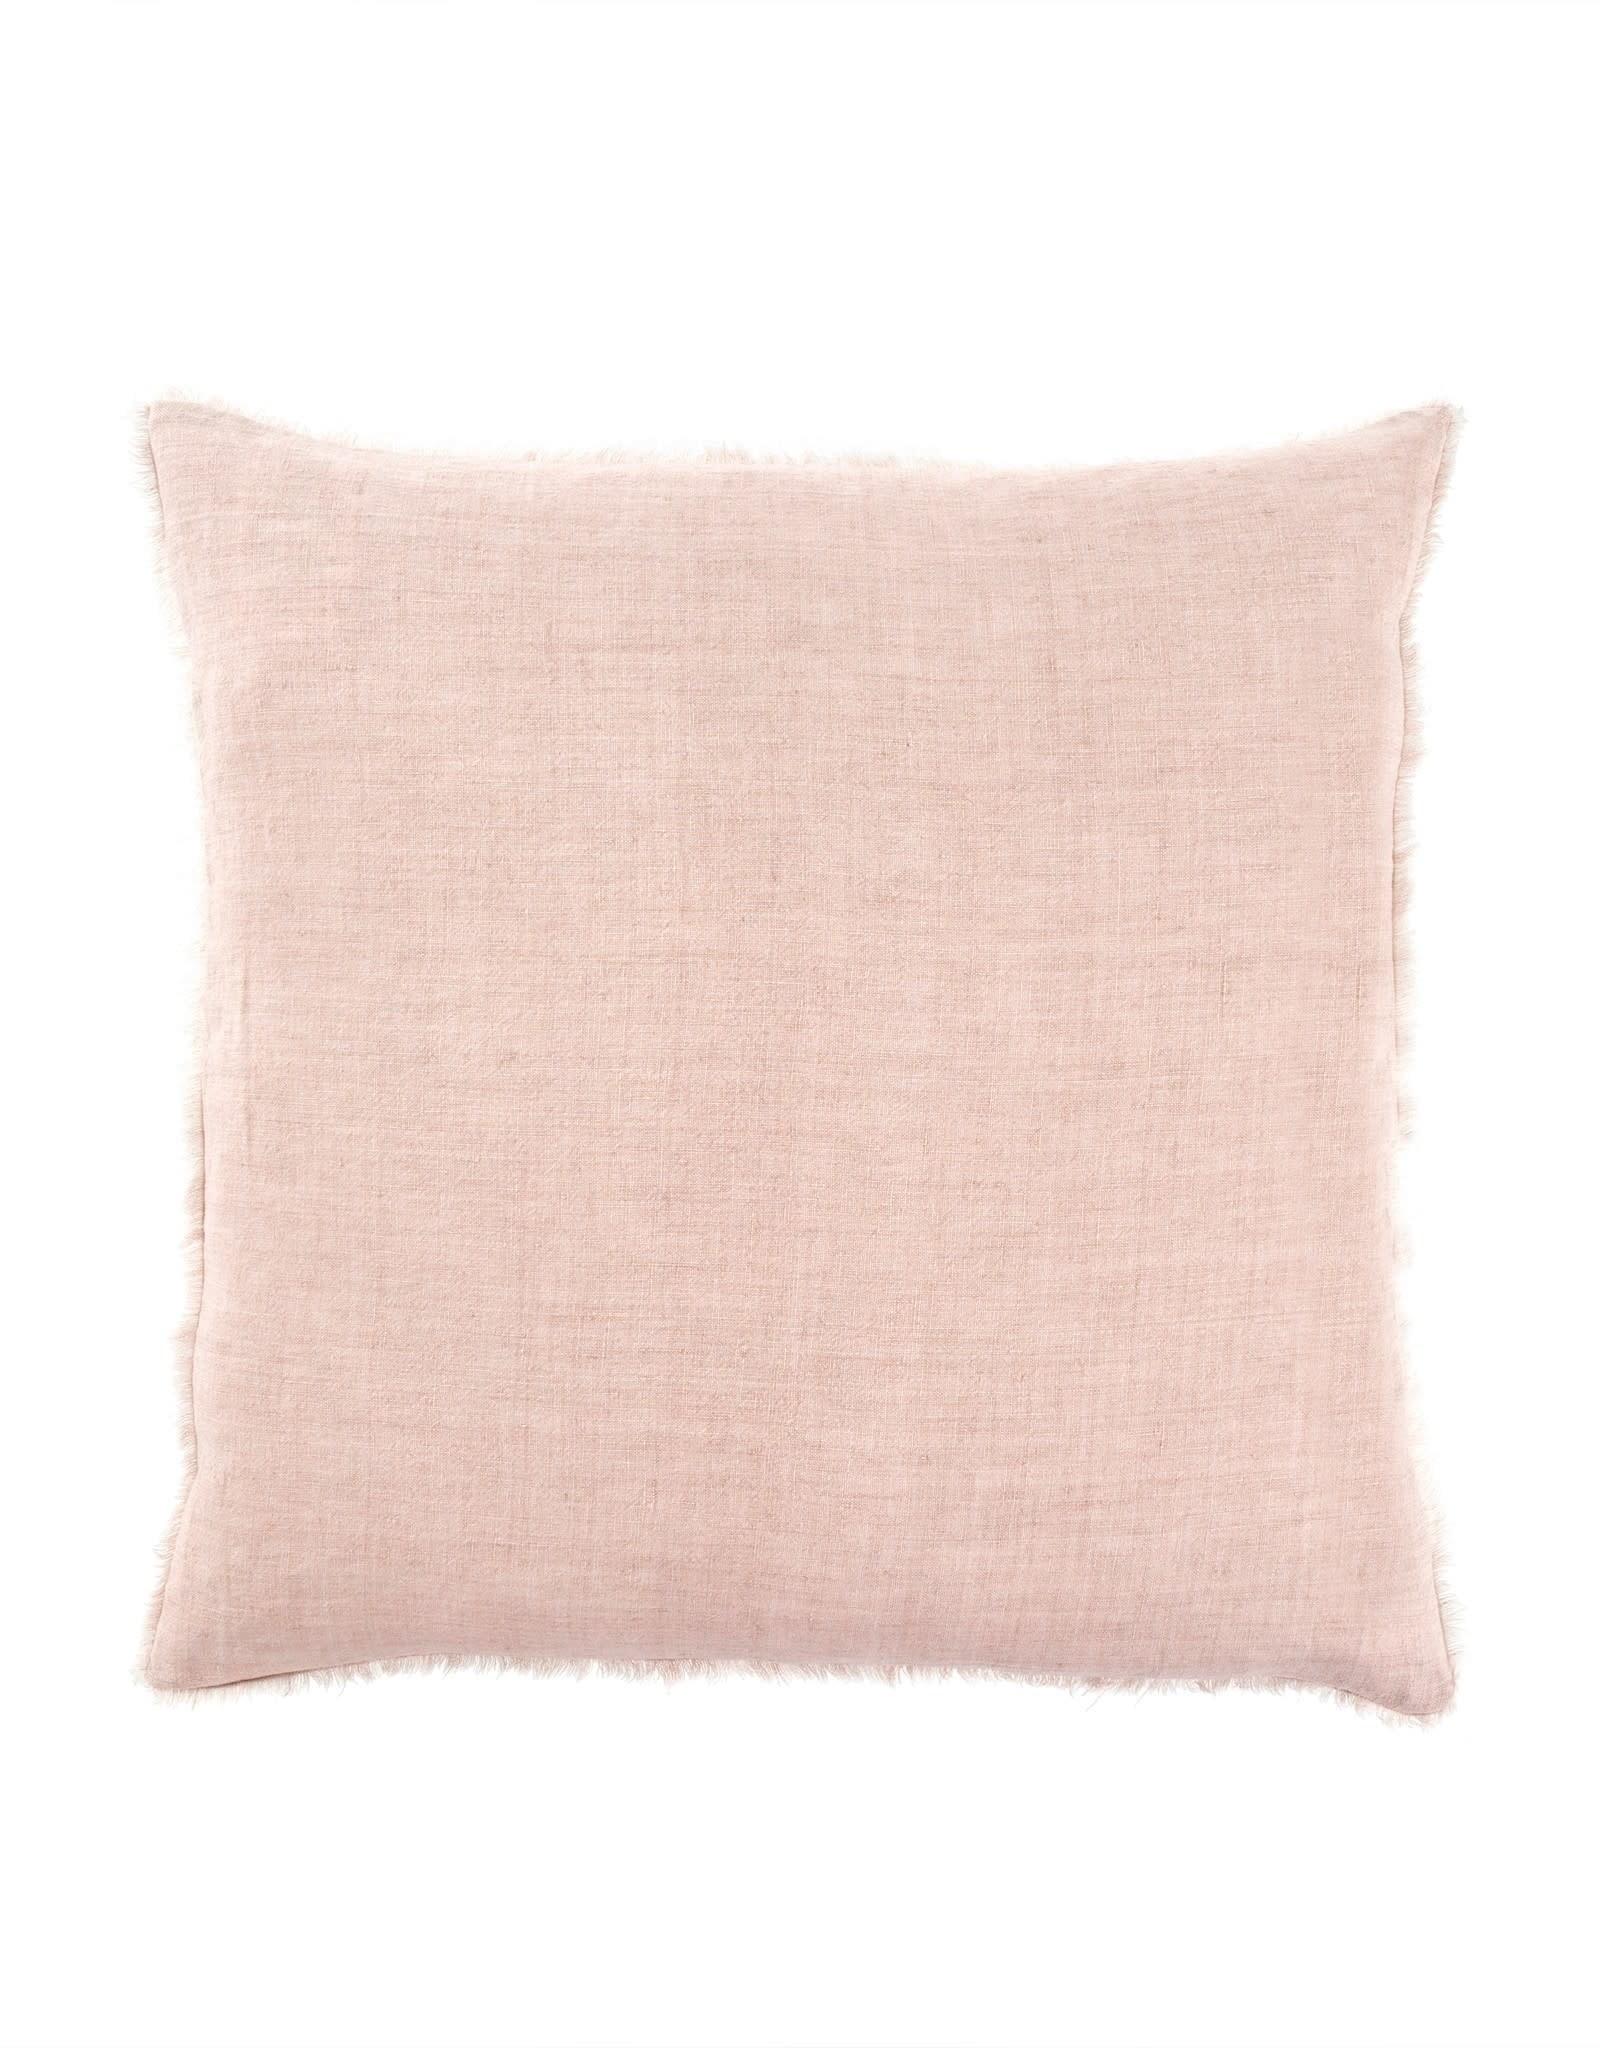 Indaba Lina Linen Pillow - Dusty Rose